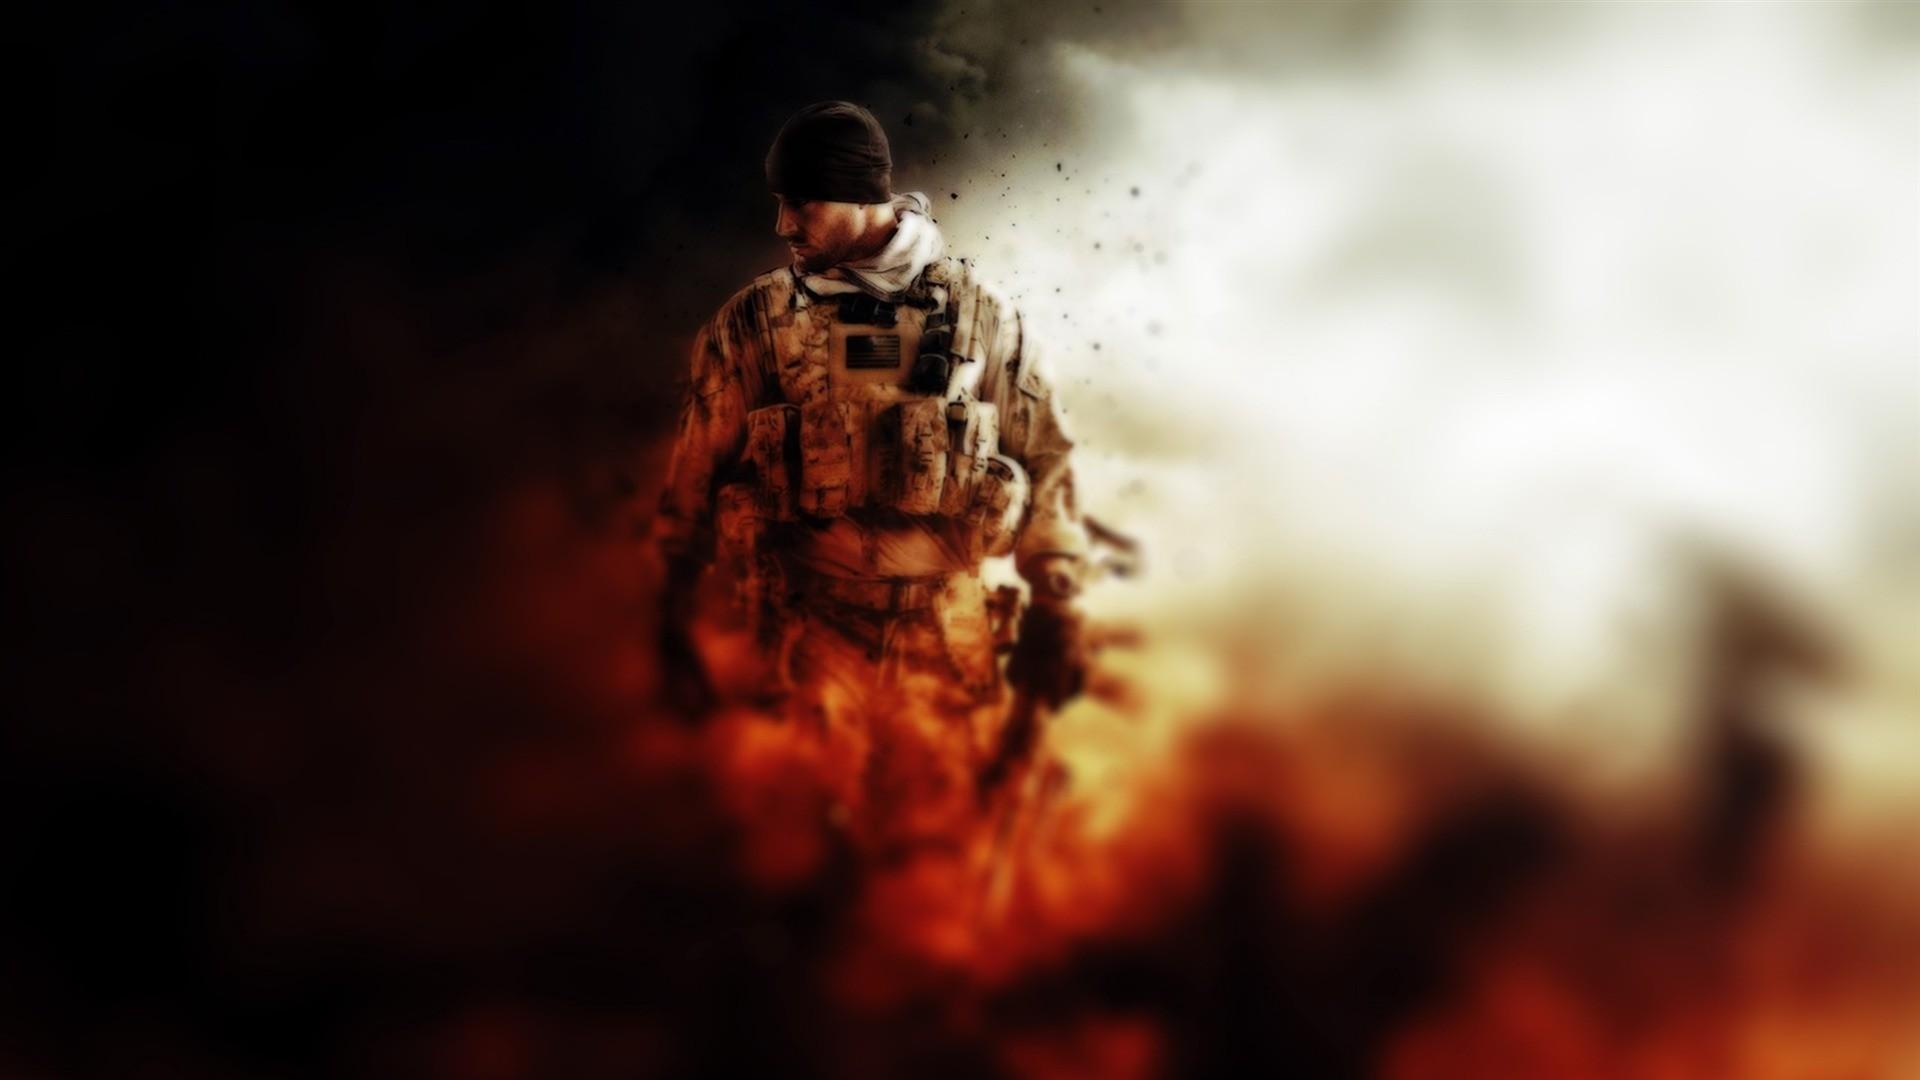 Medal Of Honor WarFighter Game HD Wallpaper 14 – wallpaper .